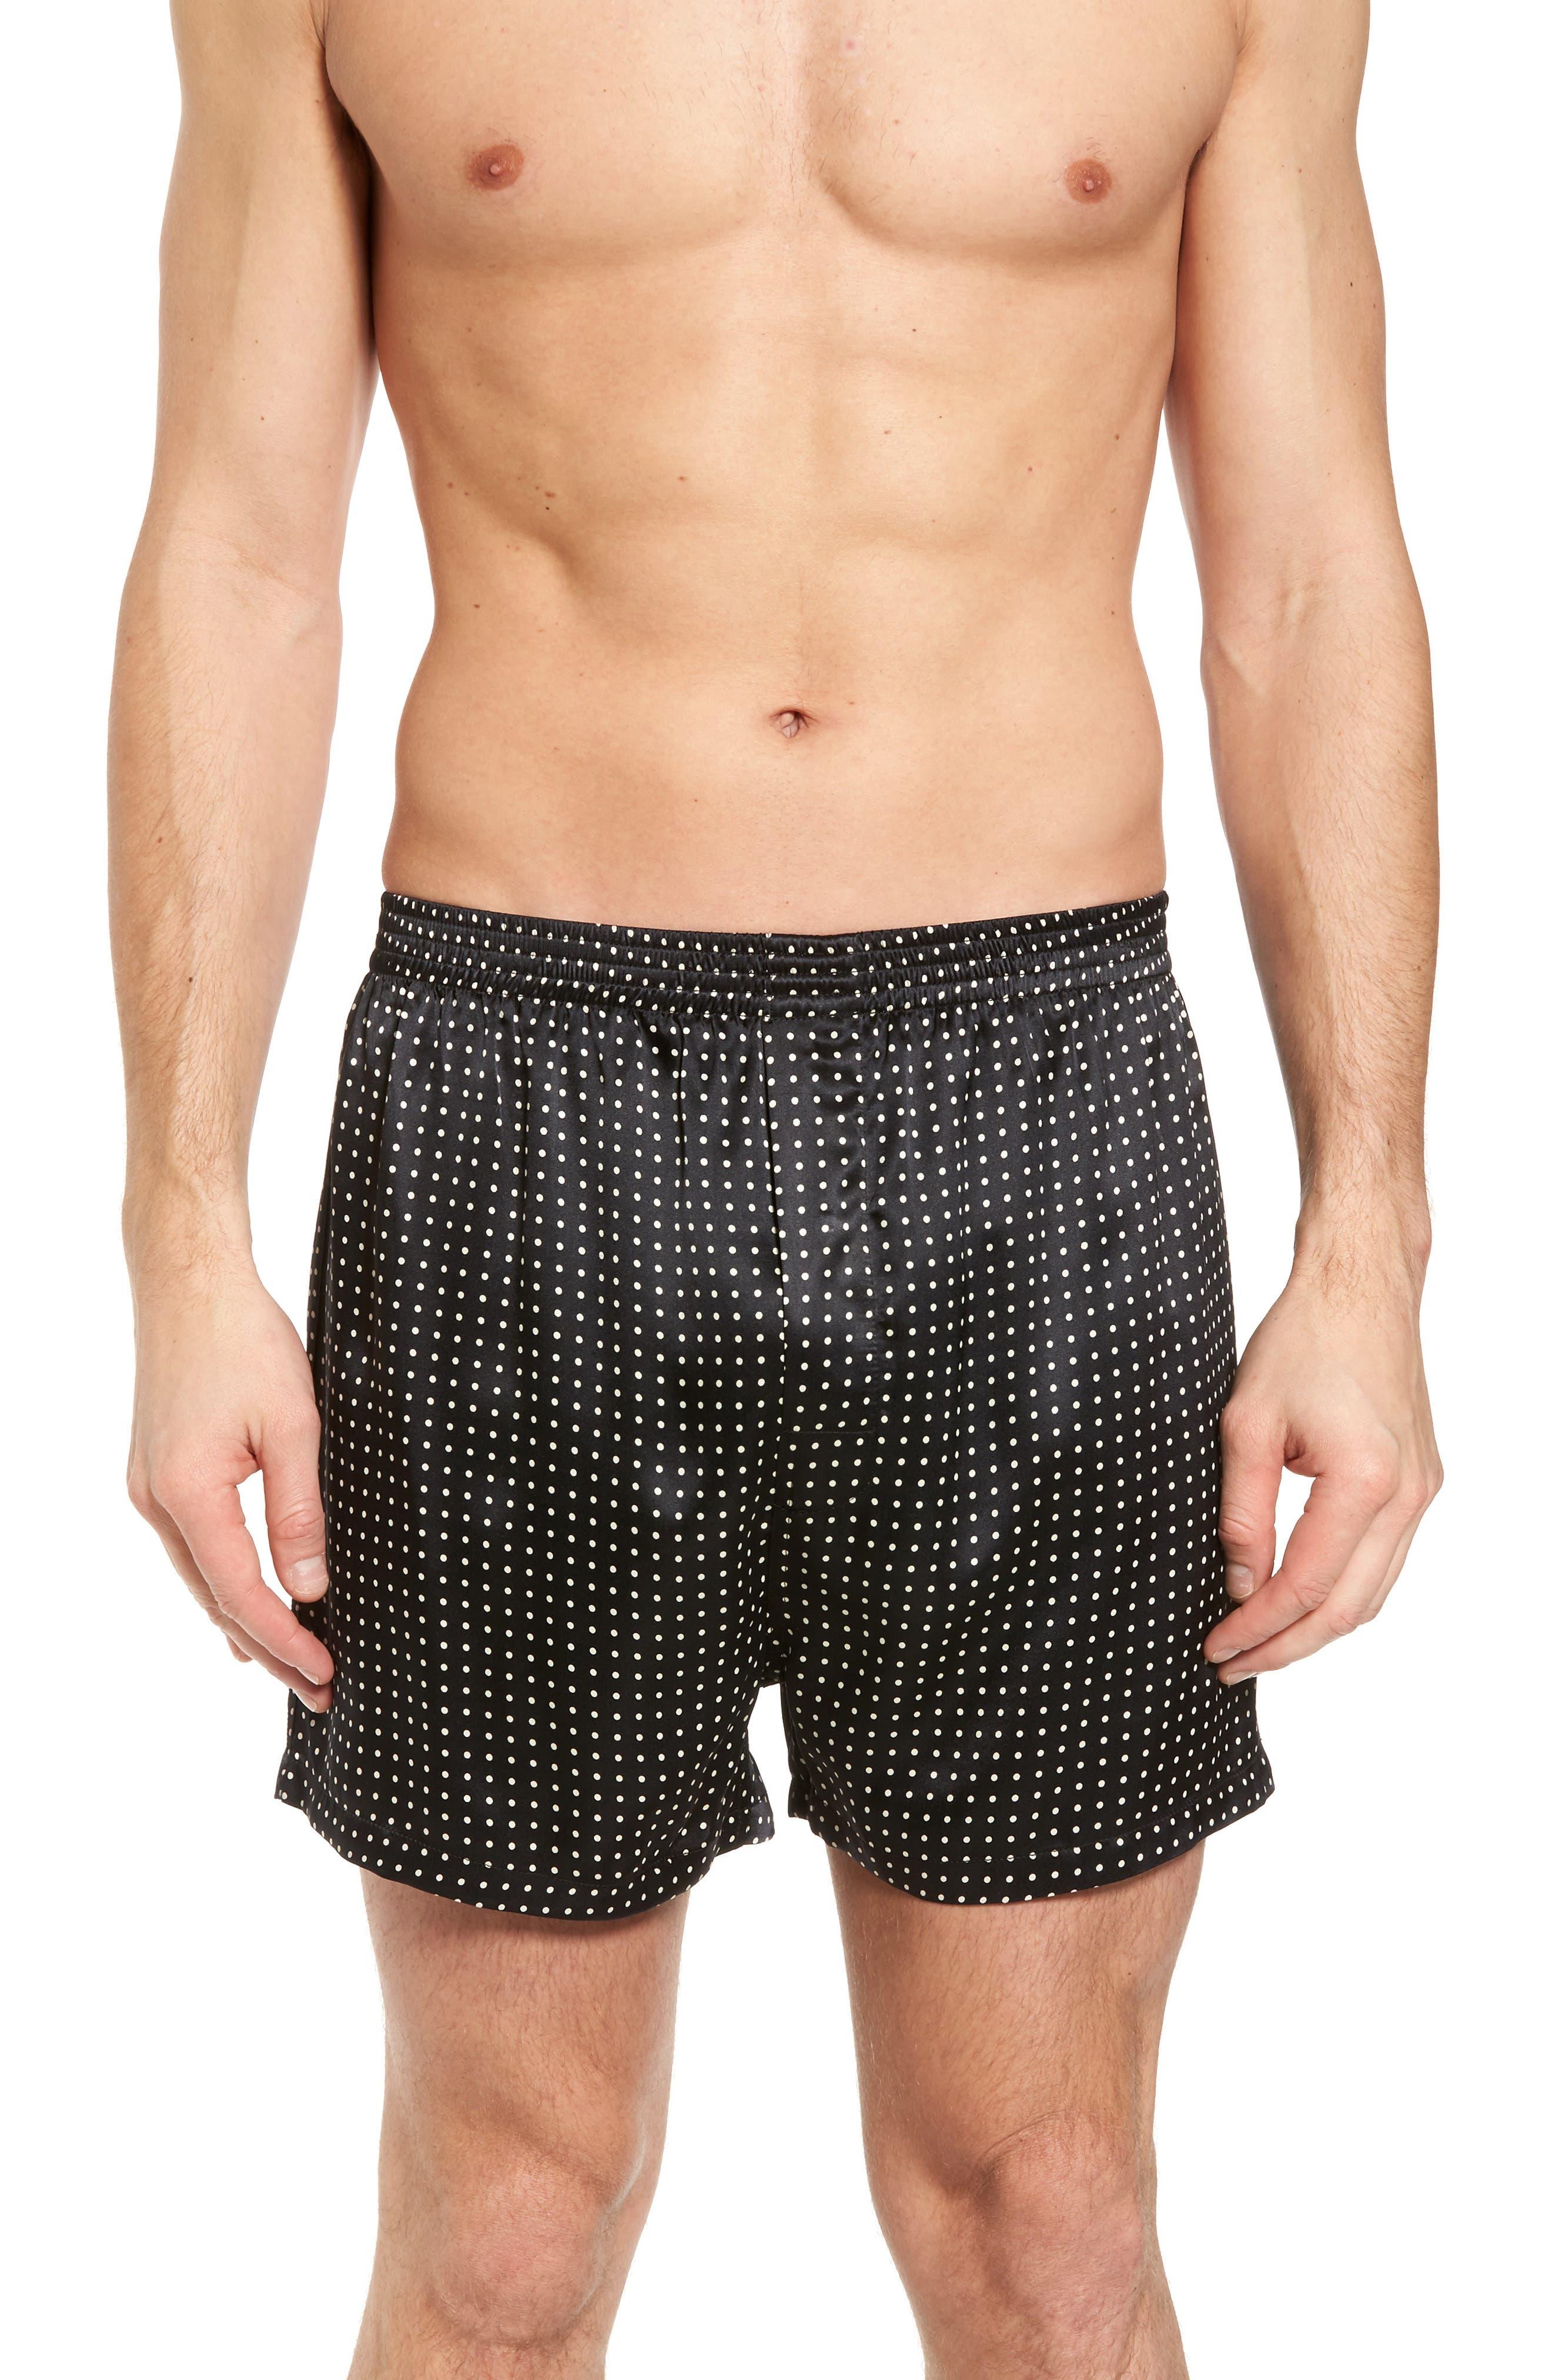 Dot Silk Boxers,                         Main,                         color, Black/ Black Piping